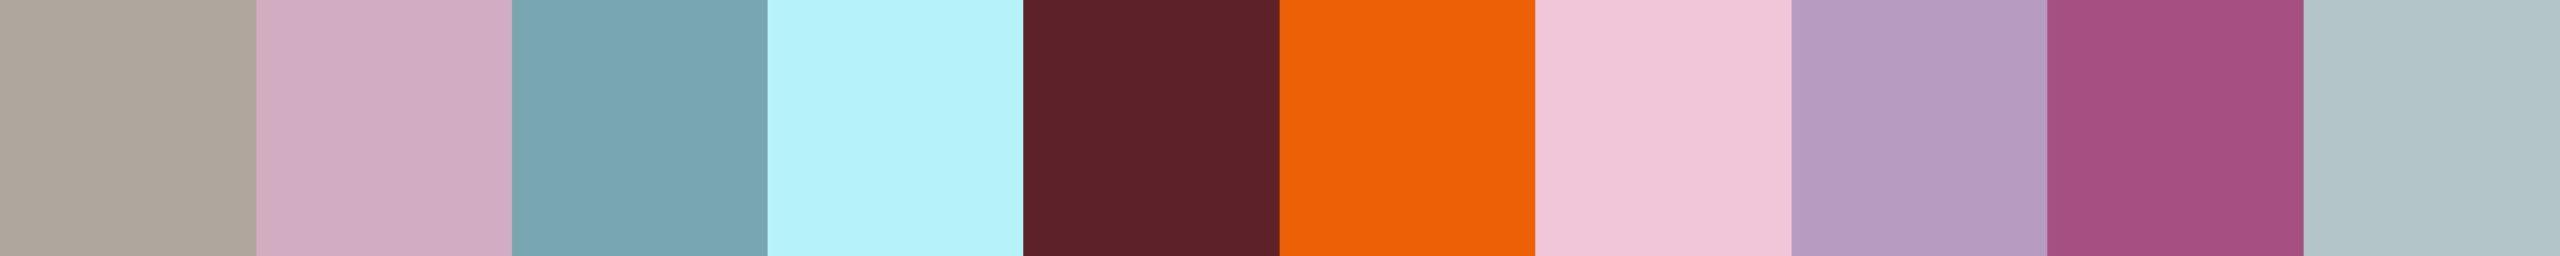 692 Astafouba Color Palette